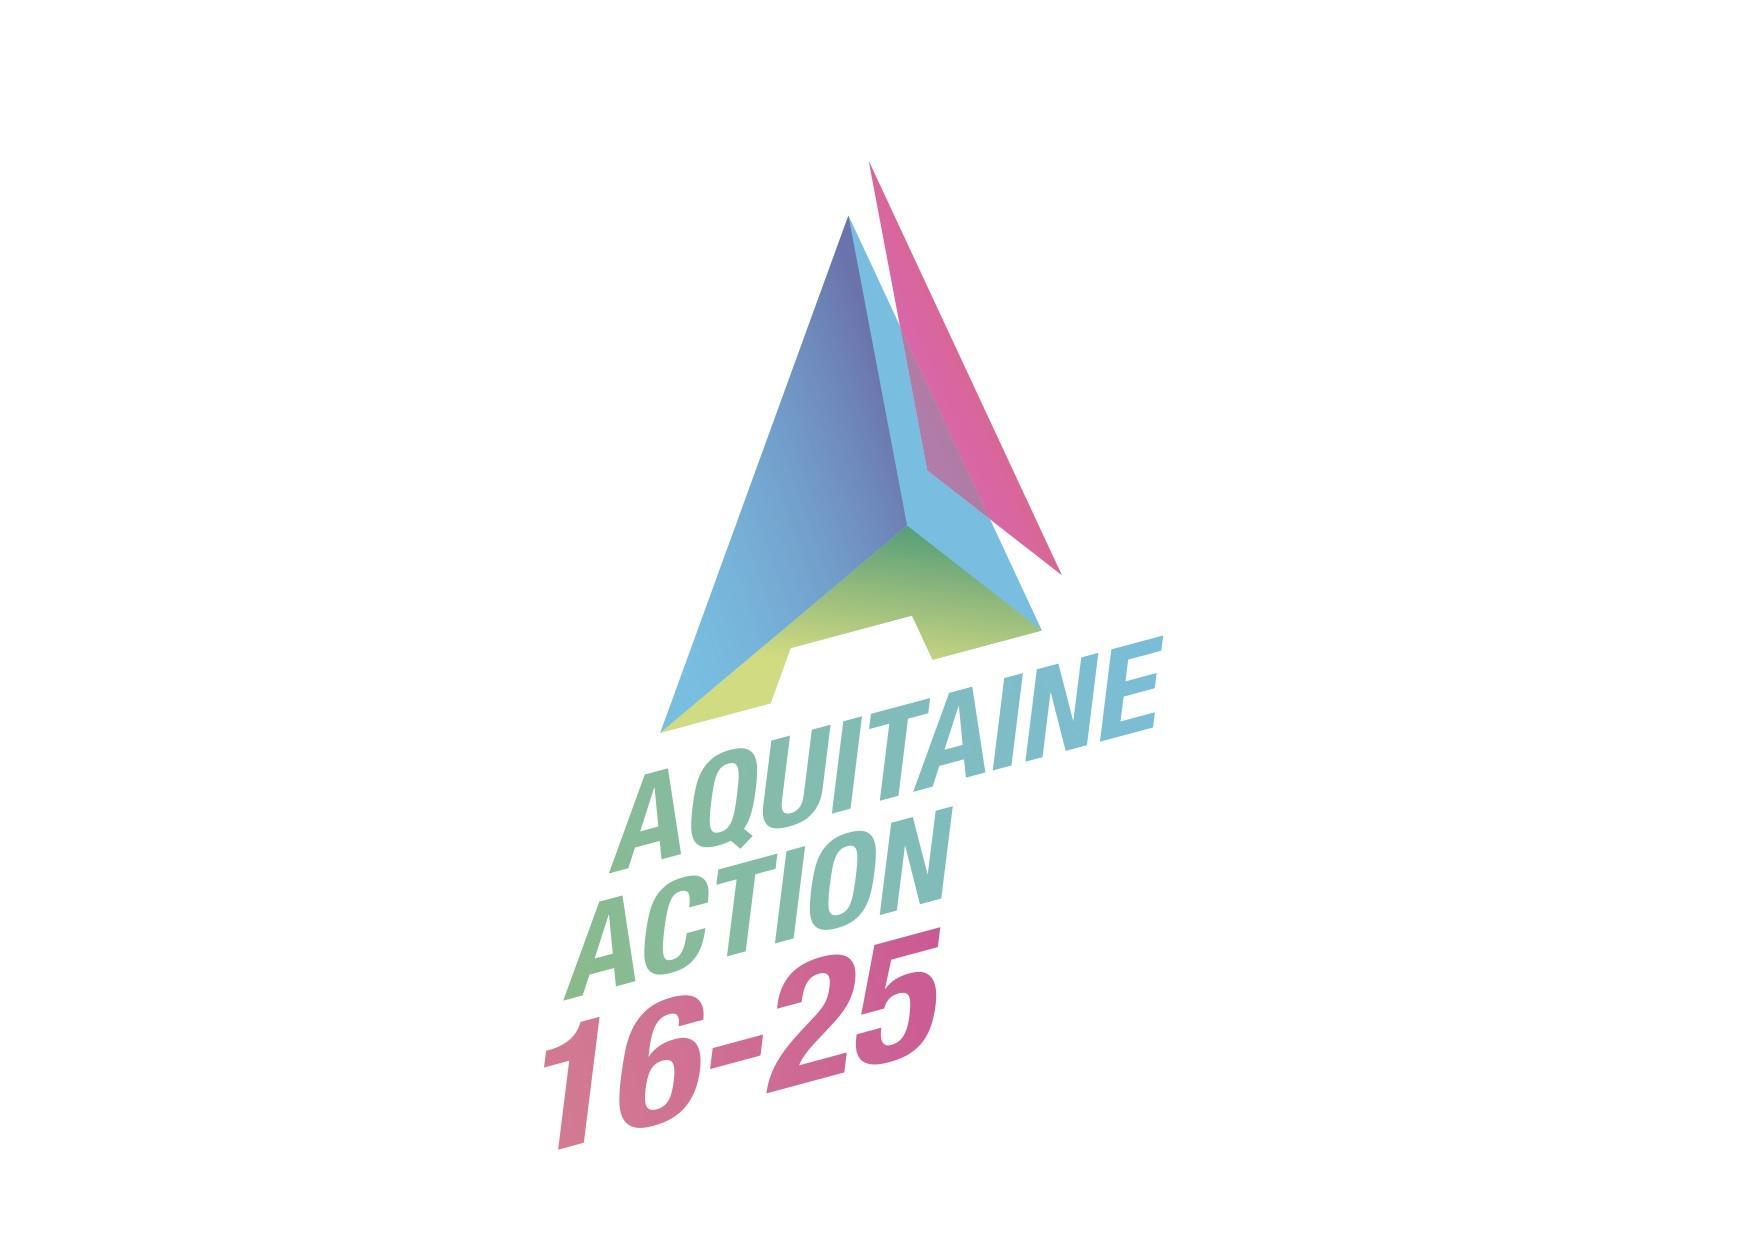 LOGO AQUITAINE ACTION 16-25.jpg (1754×1241)